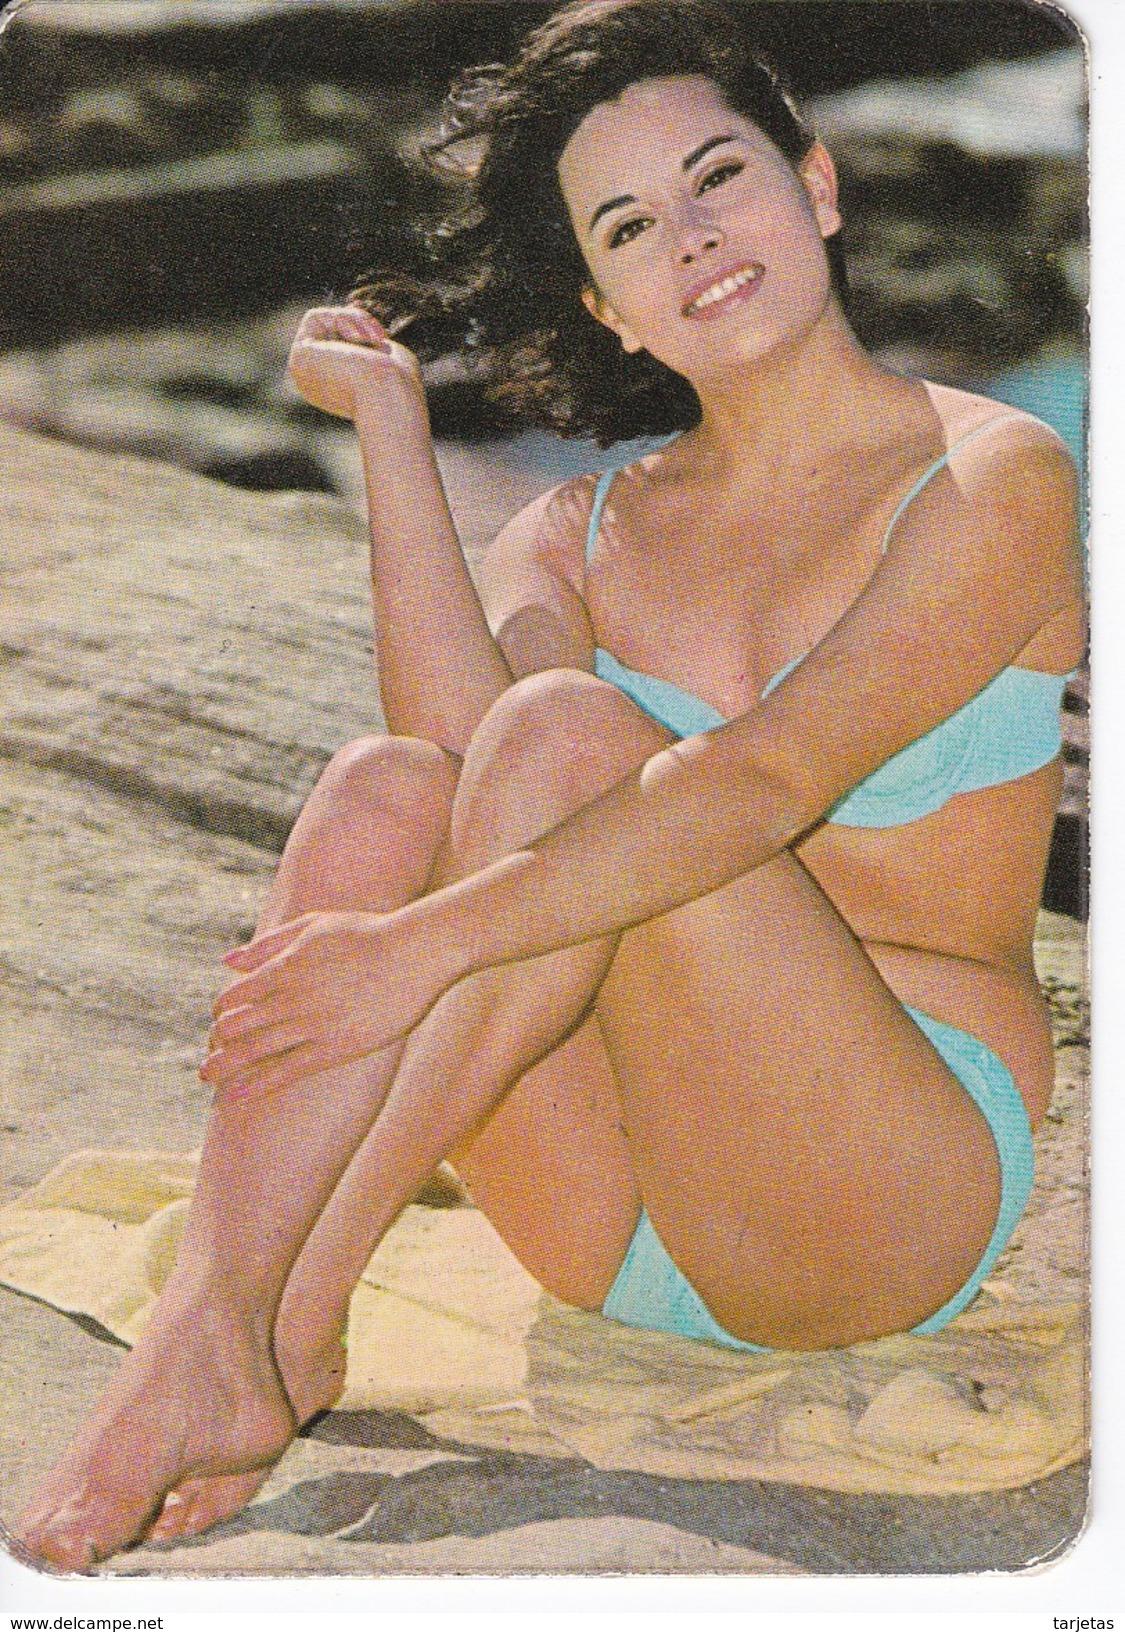 CALENDARIO DEL AÑO 1973 DE UNA CHICA SEXI (NUDE-DESNUDO) (CALENDRIER-CALENDAR) - Calendarios